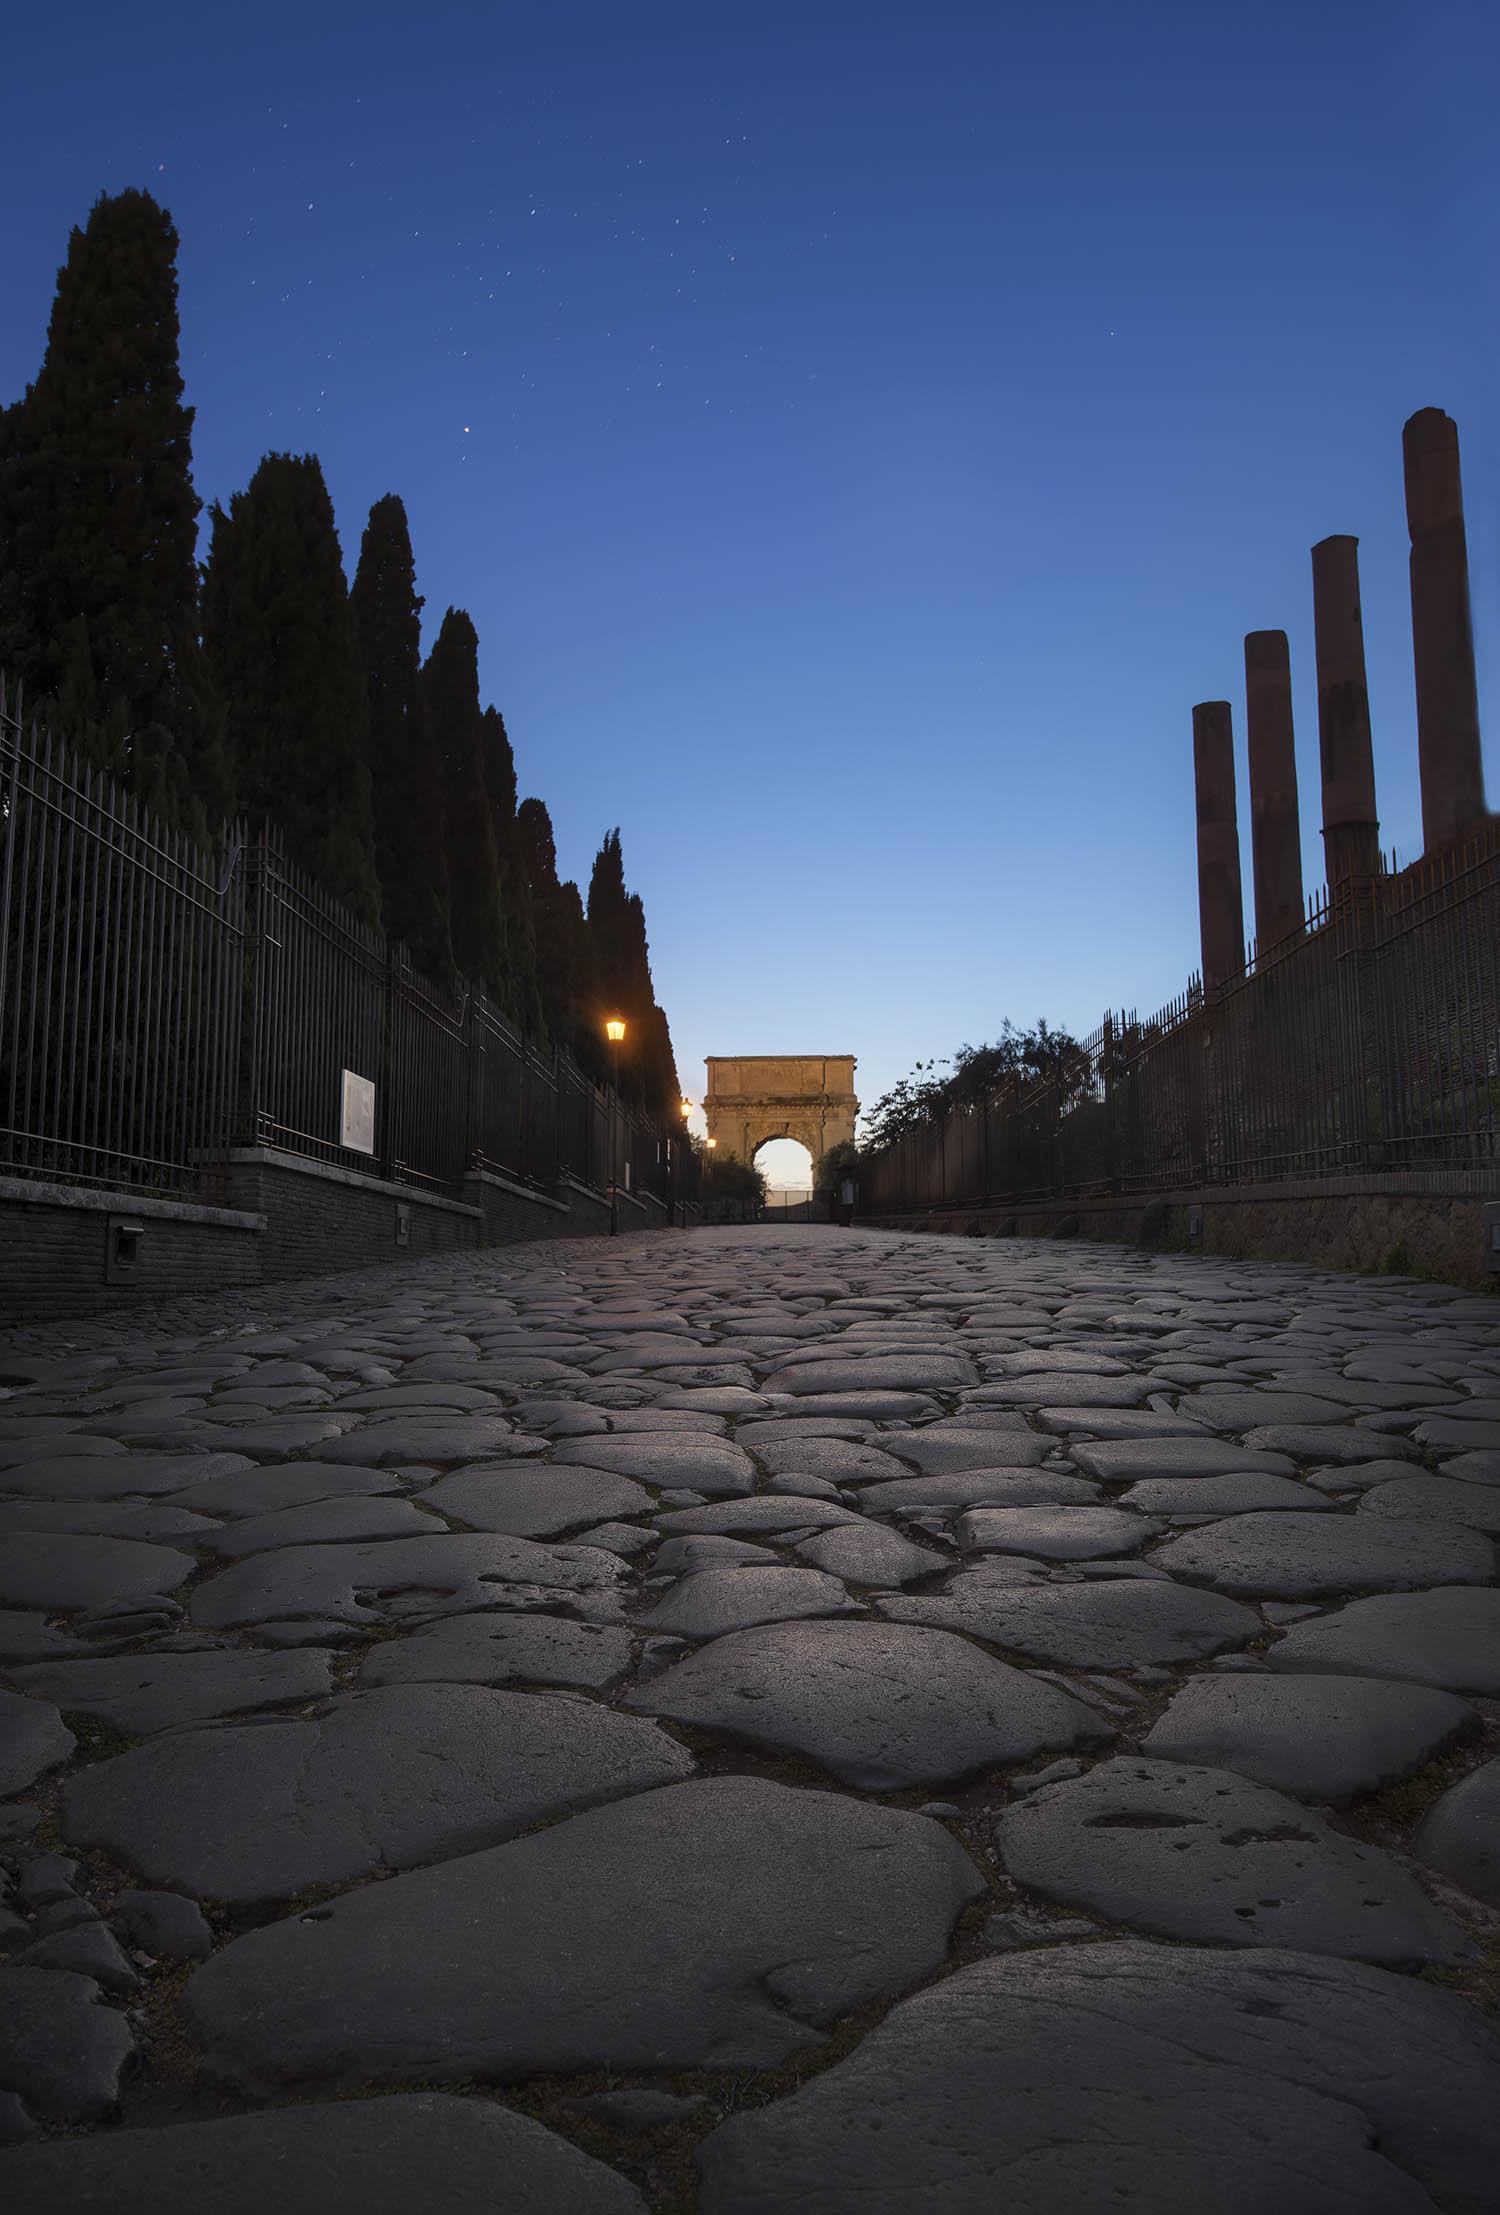 Giuseppe Sapori - Night gate